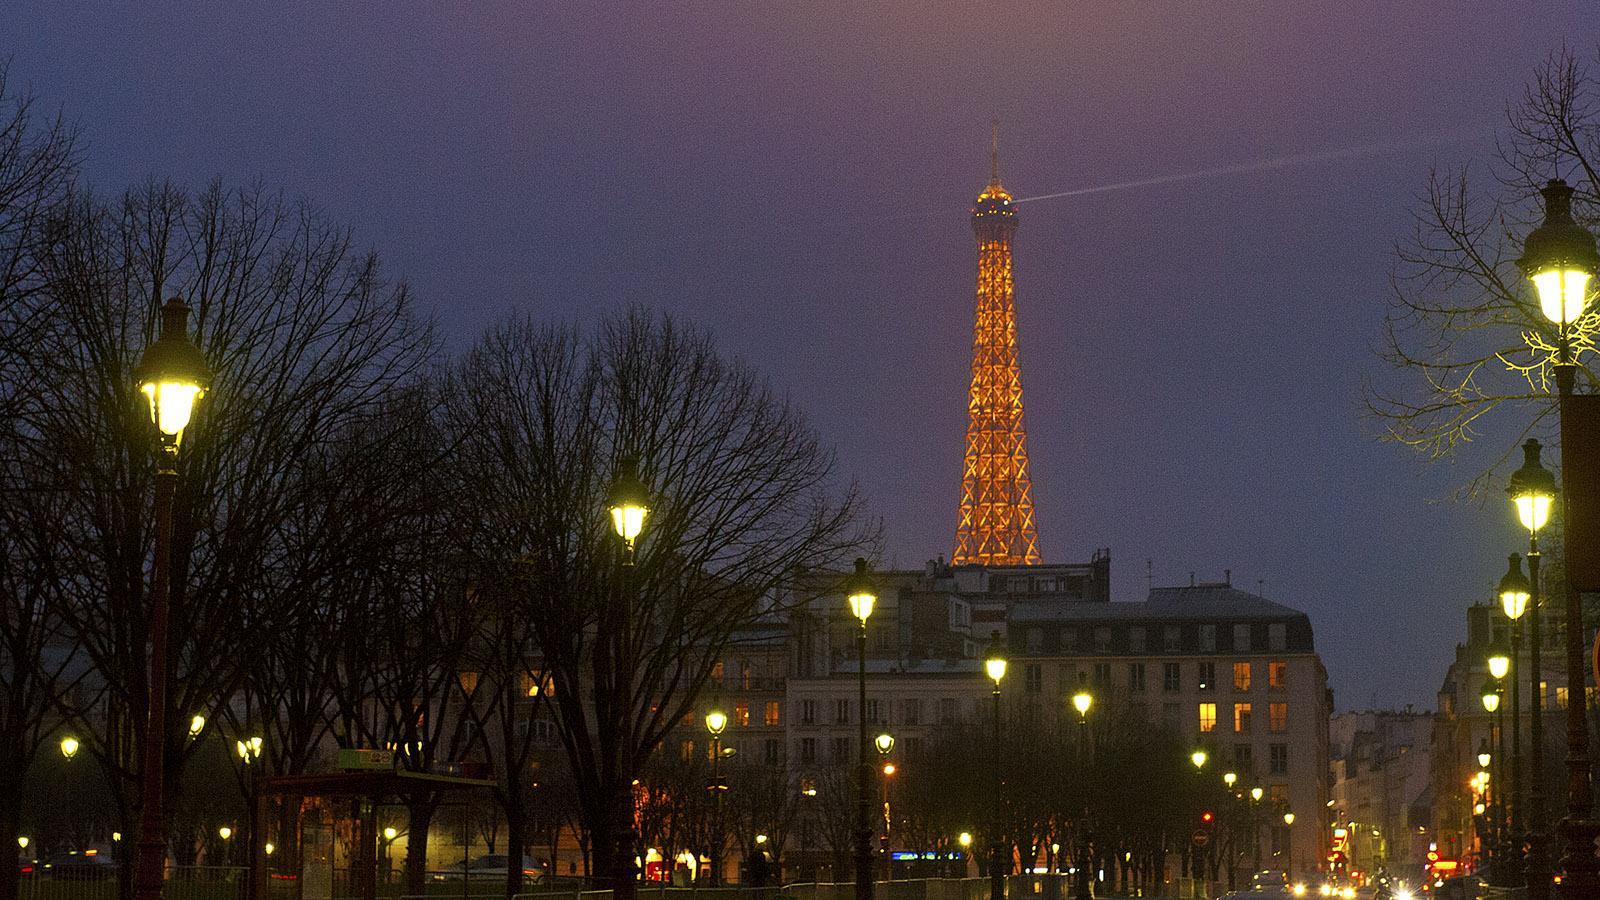 ville lumière: Der Eiffelturm in der Dämmerung. Foto: Hilke Maunder